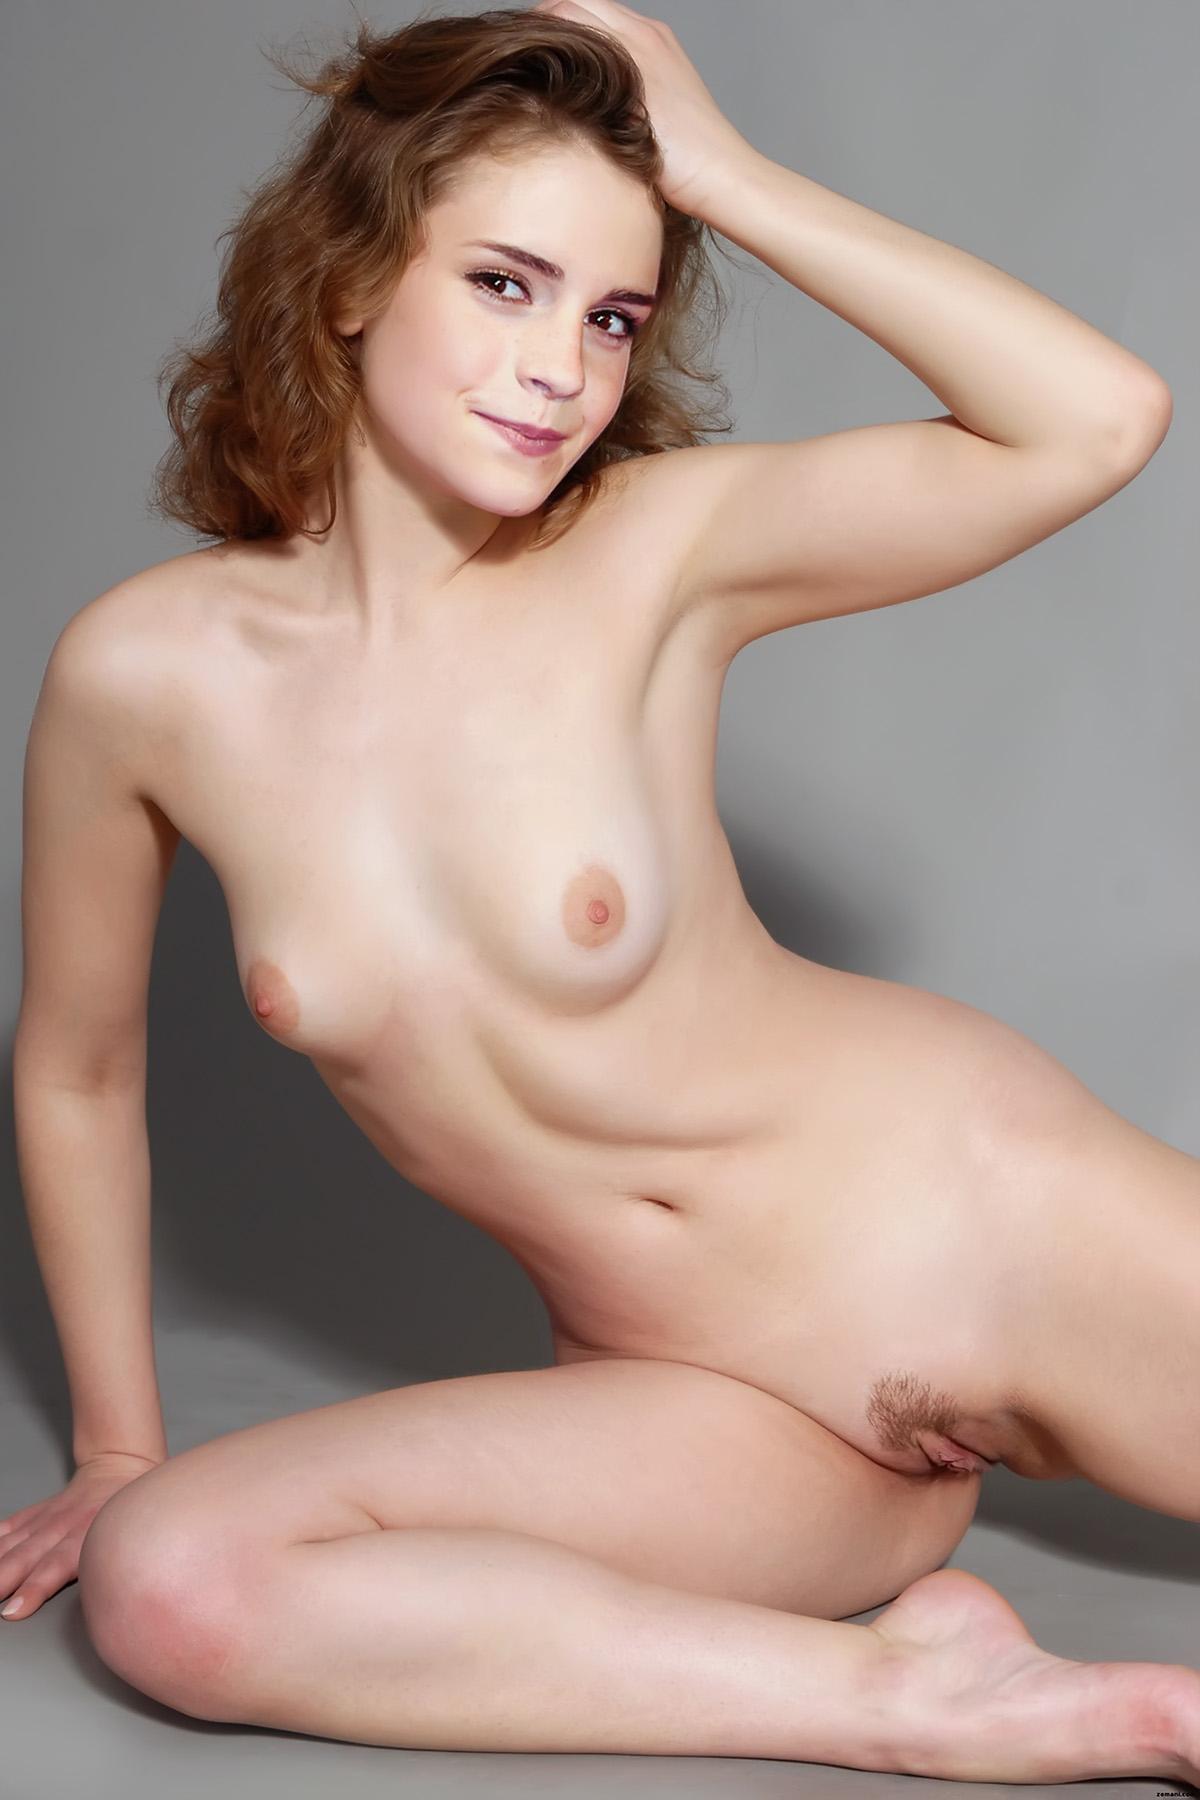 Topless Sarah Jane Honeywell Hot Girls Wallpaper